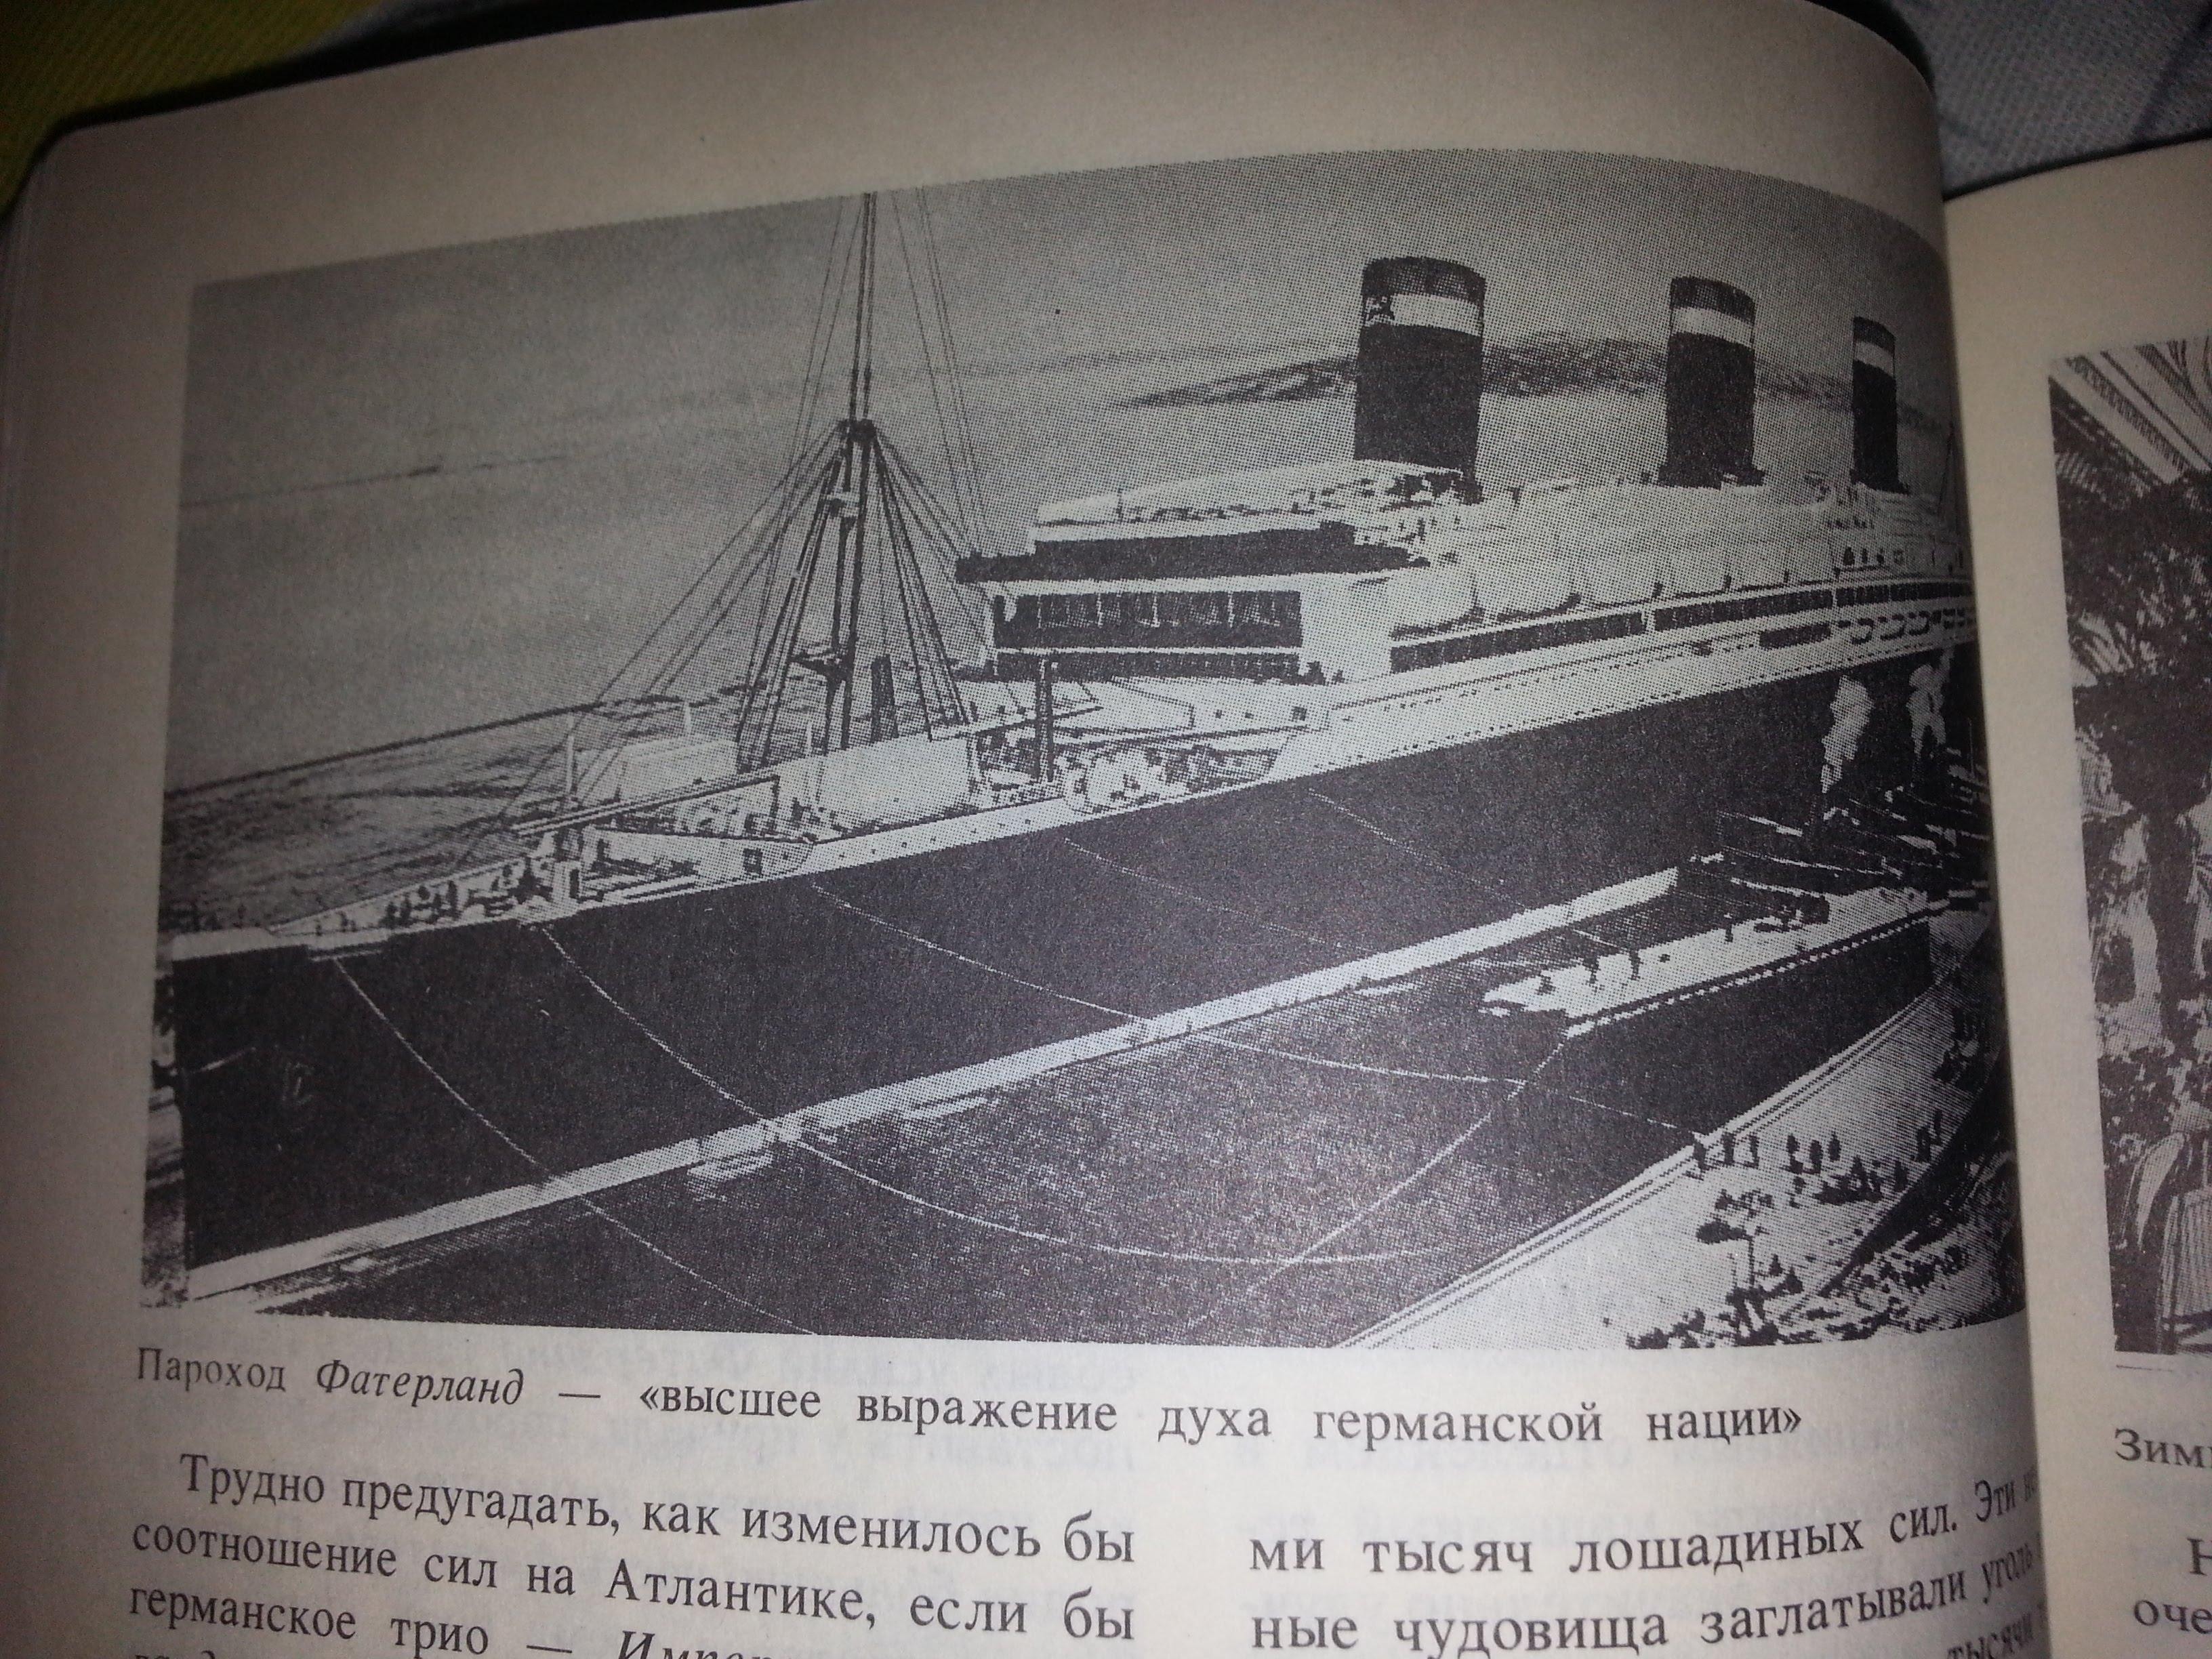 Немецкий лайнер Vaterland